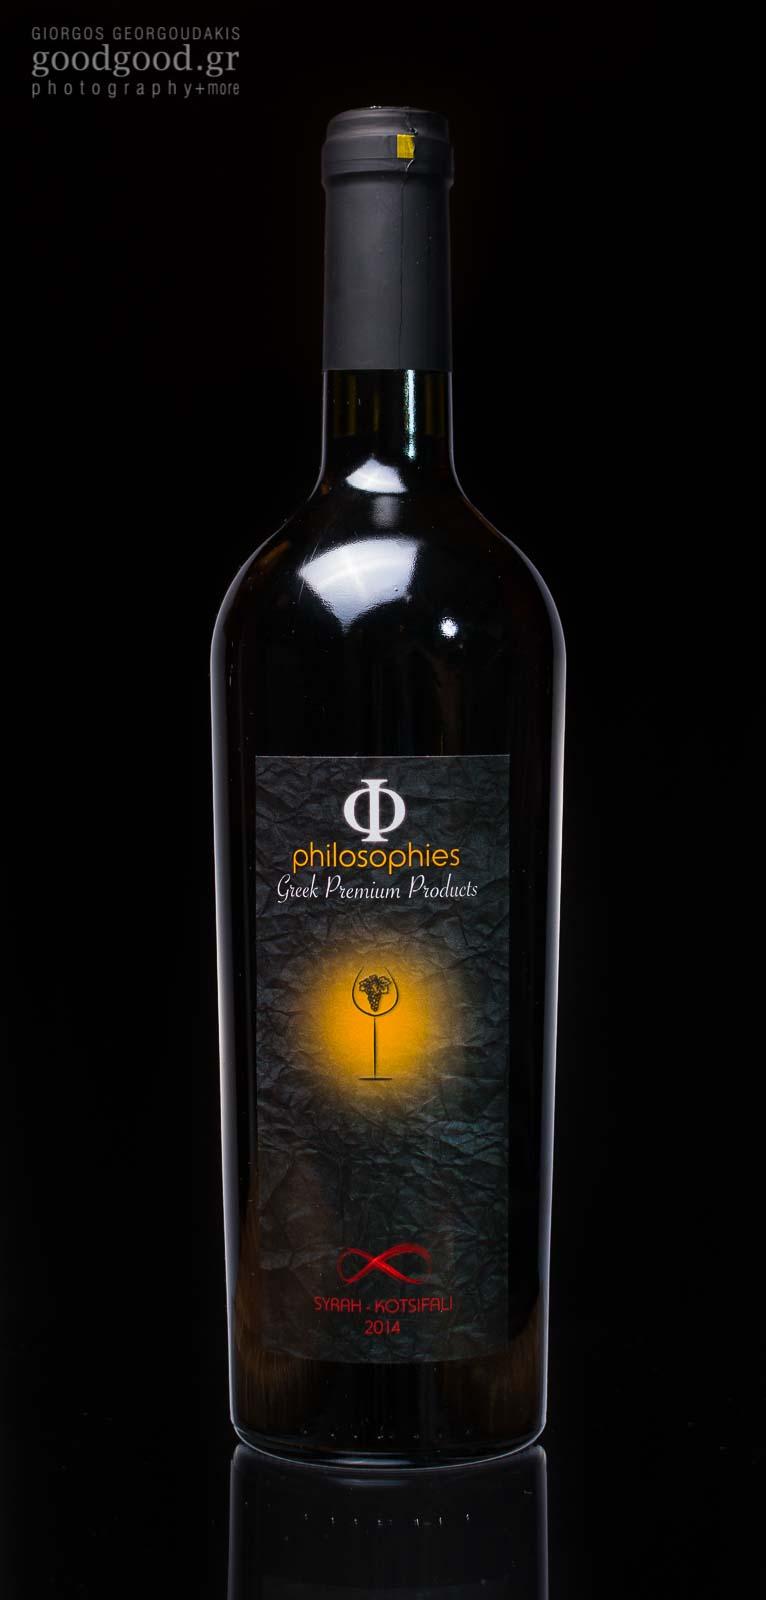 A Syrah-Kotsifali wine bottle, photographed in dark background